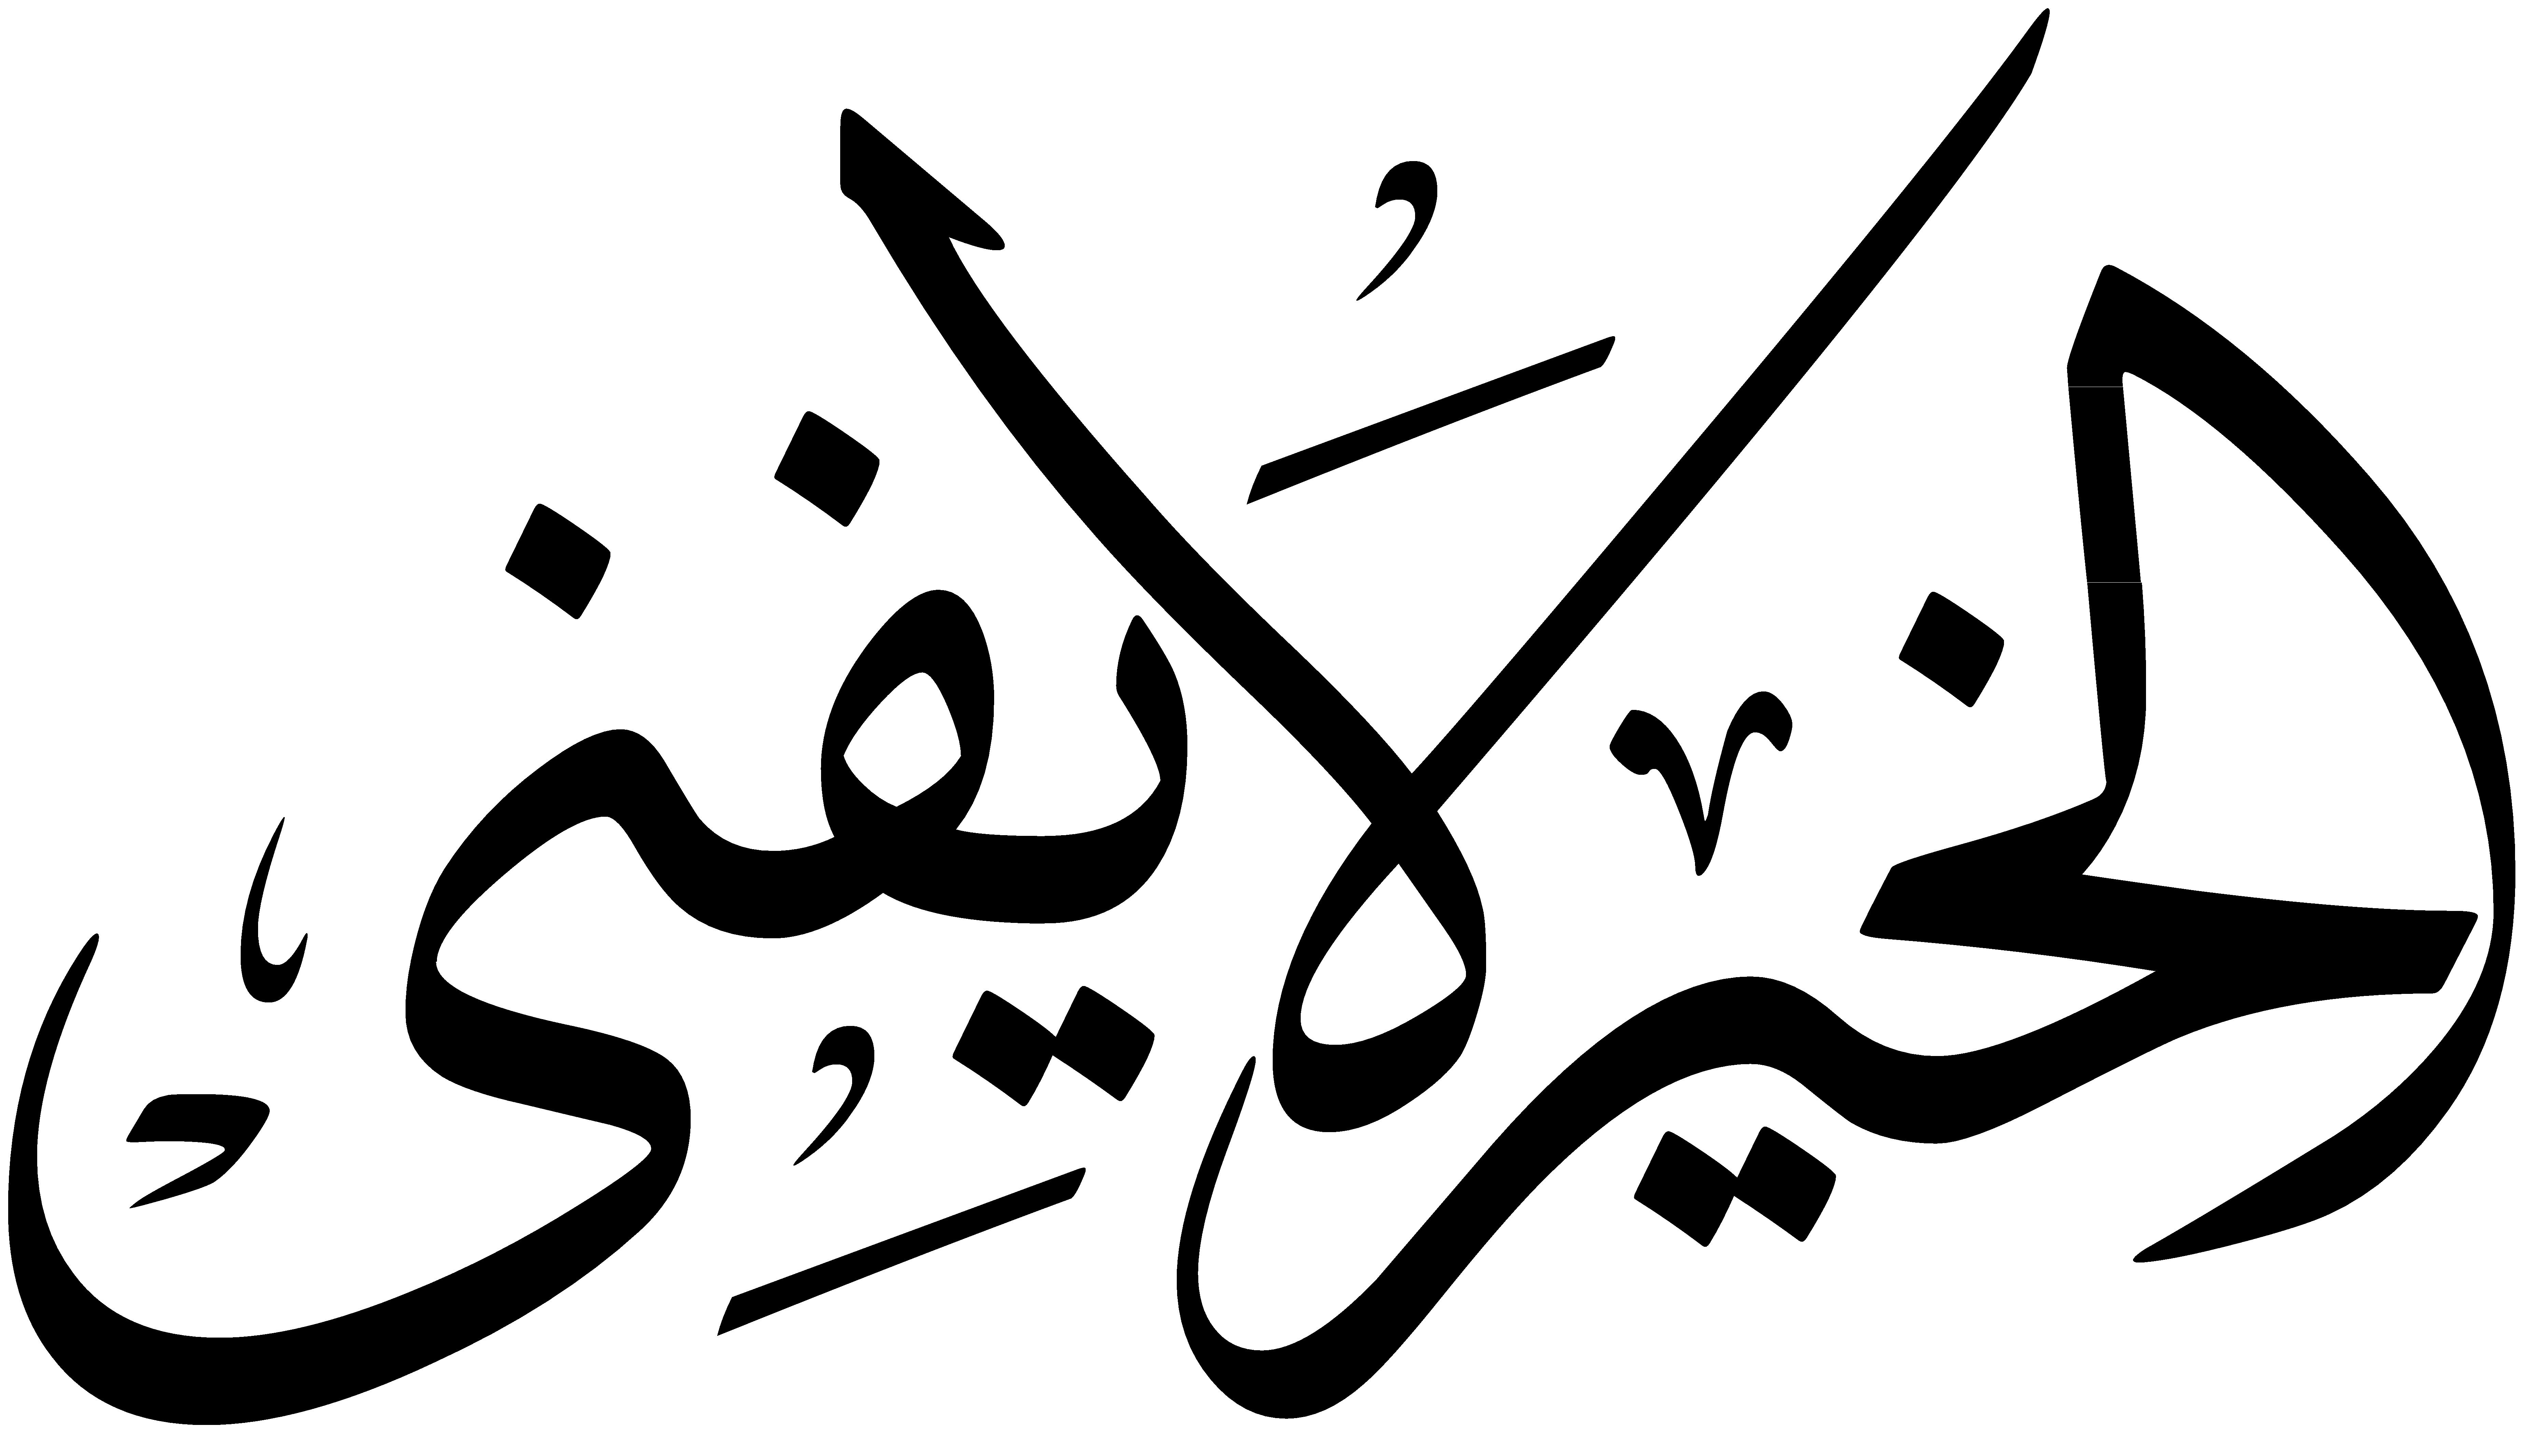 Pin By بسم الله الرحمن الرحيم On 2 مخطوطات اسلامية Arabic Calligraphy Calligraphy Arabic